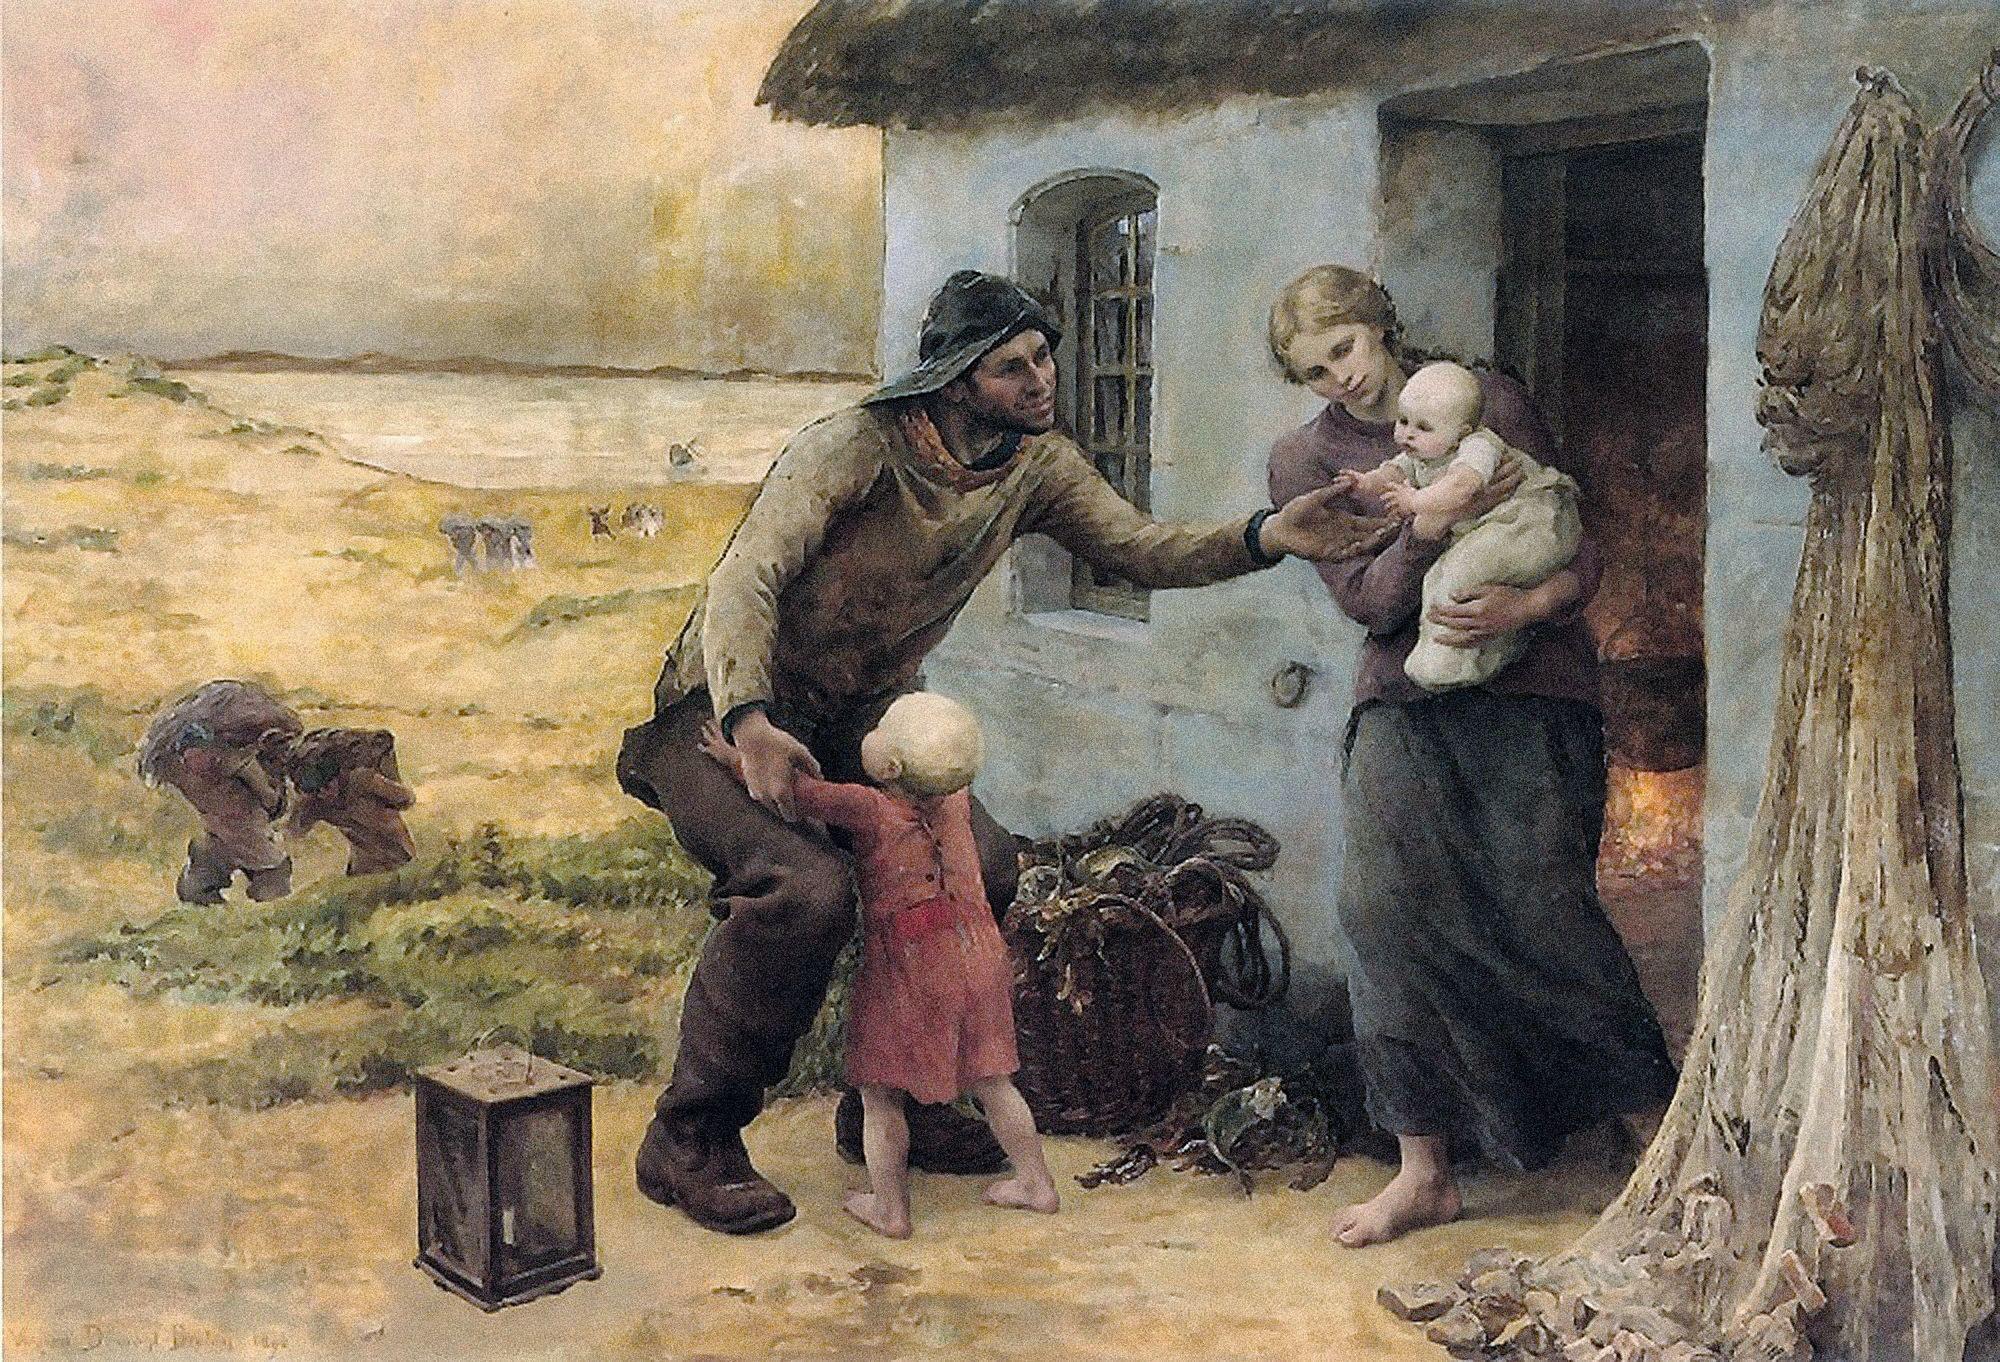 Virginie Demont-Breton, Le Foyer